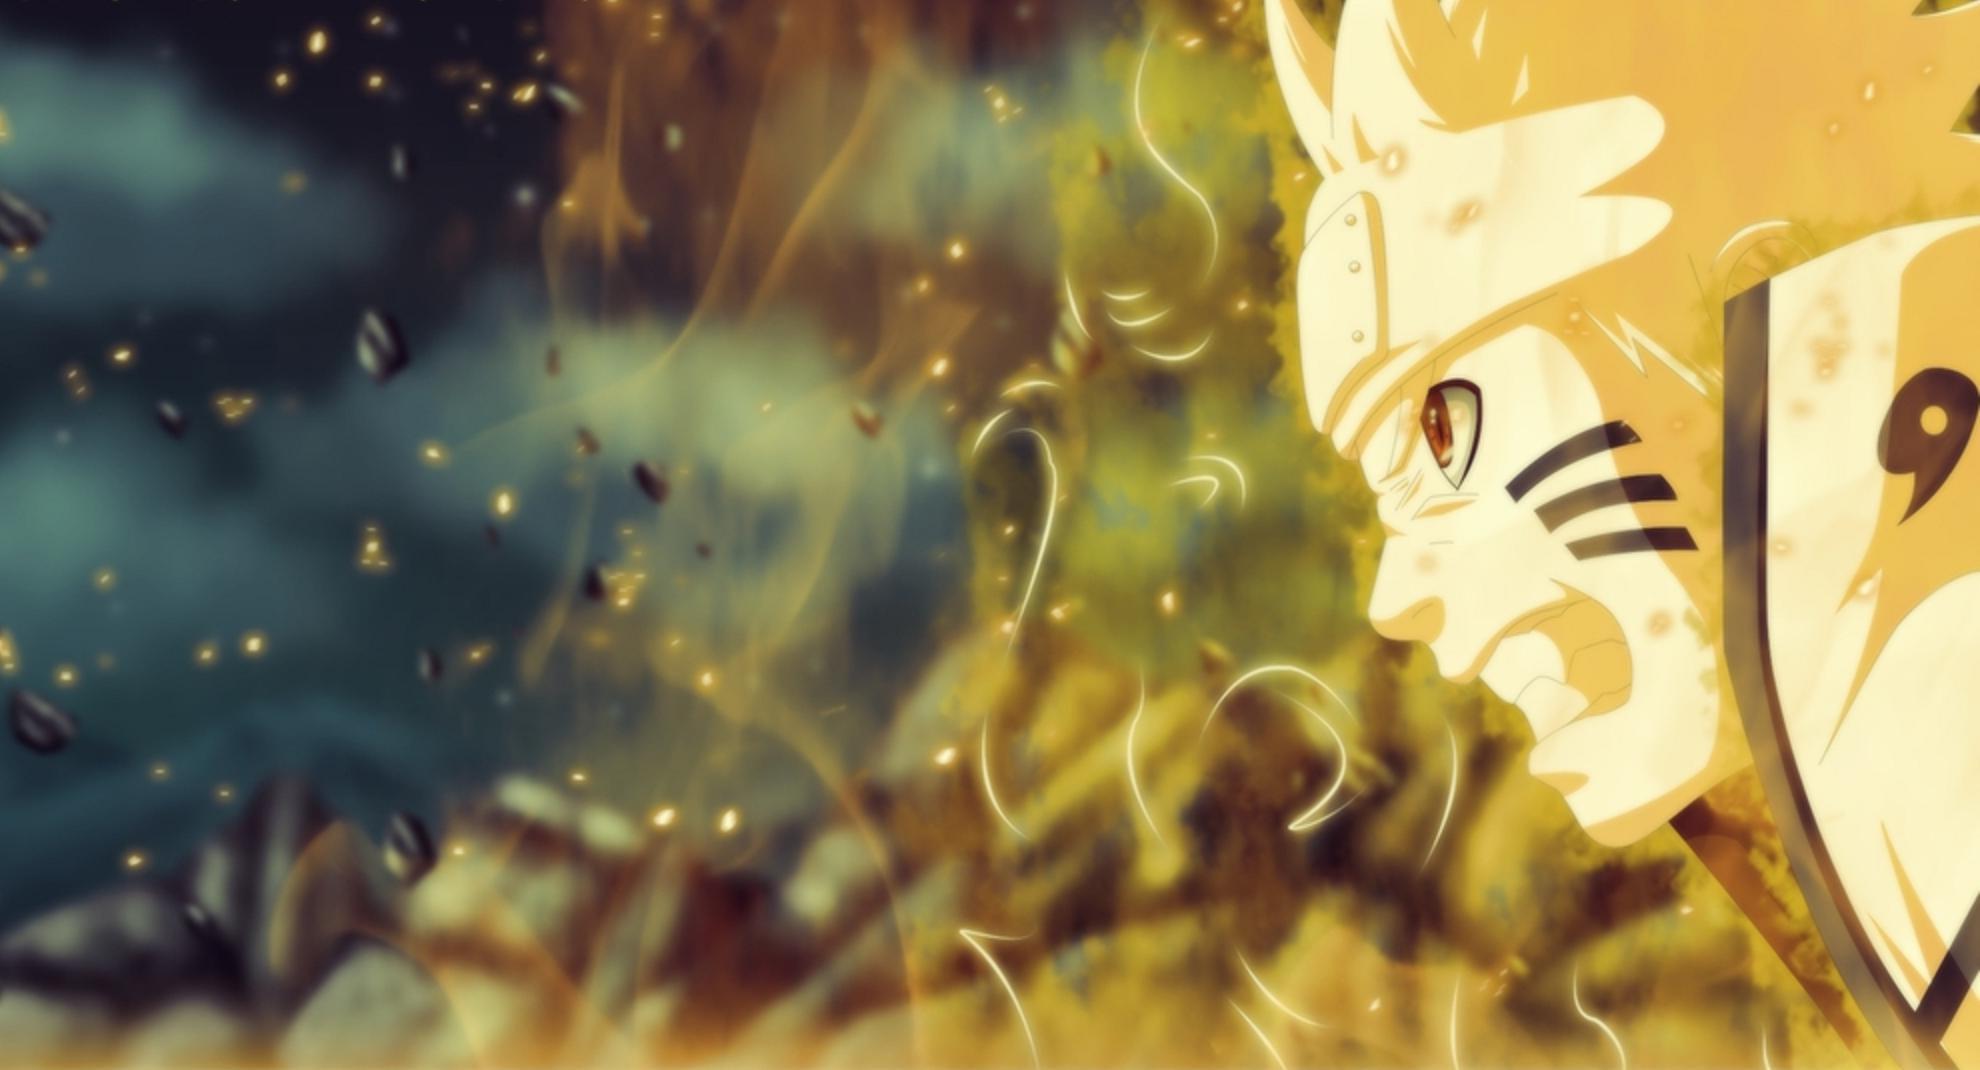 Naruto Wallpapers Hd 1080p Naruto Uzumaki Wallpapers High Quality Download Free